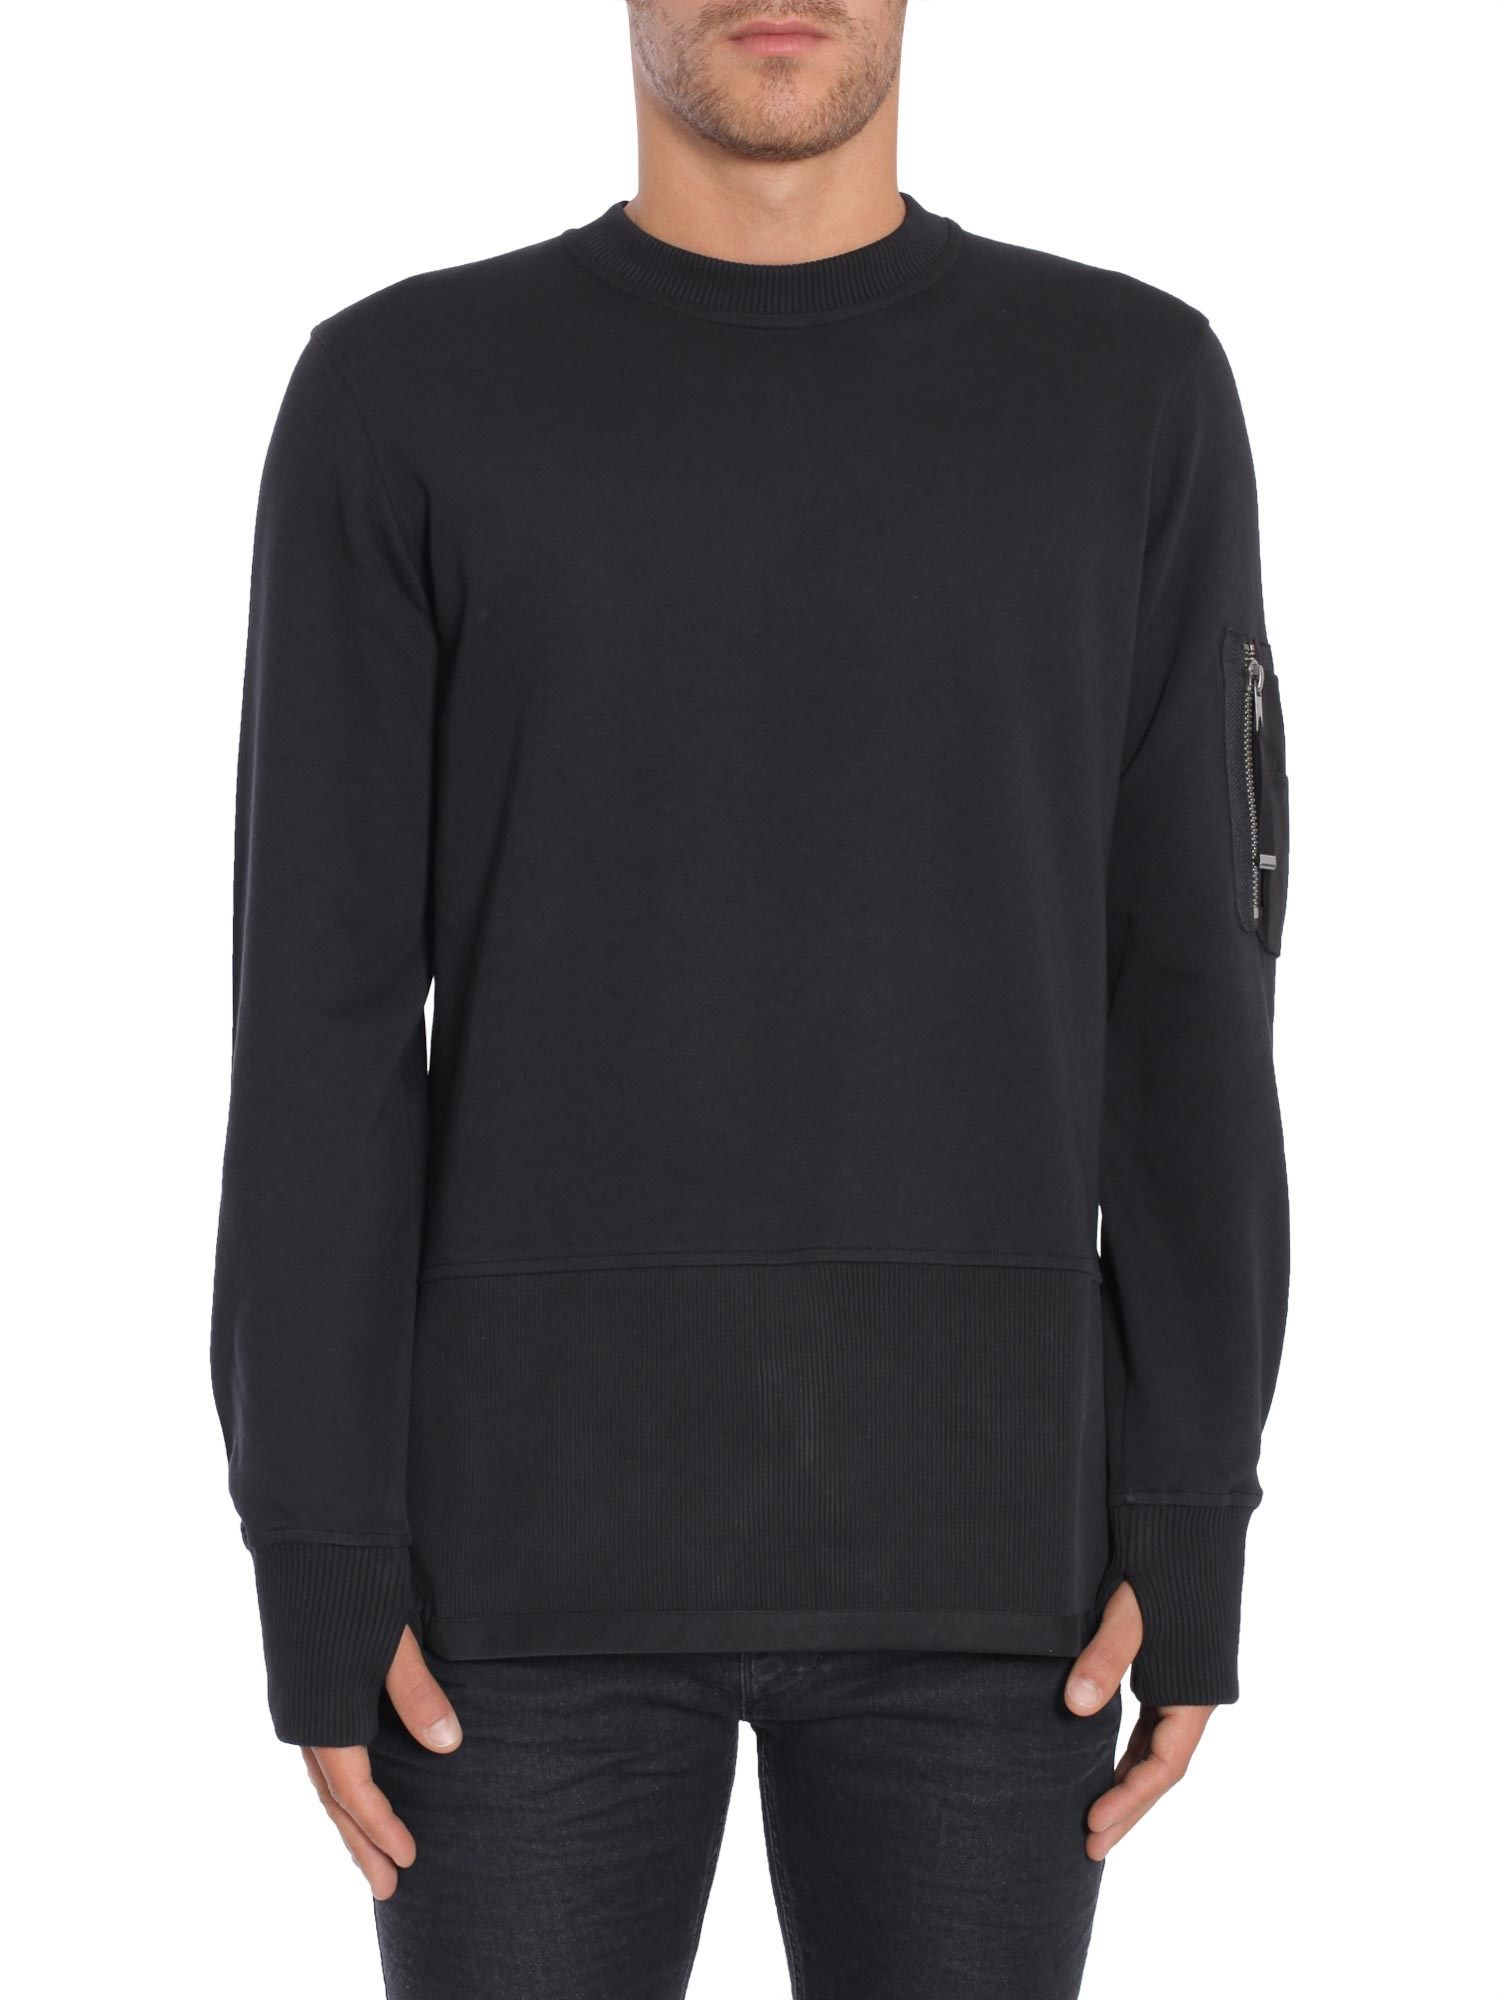 Storney-lf Sweatshirt